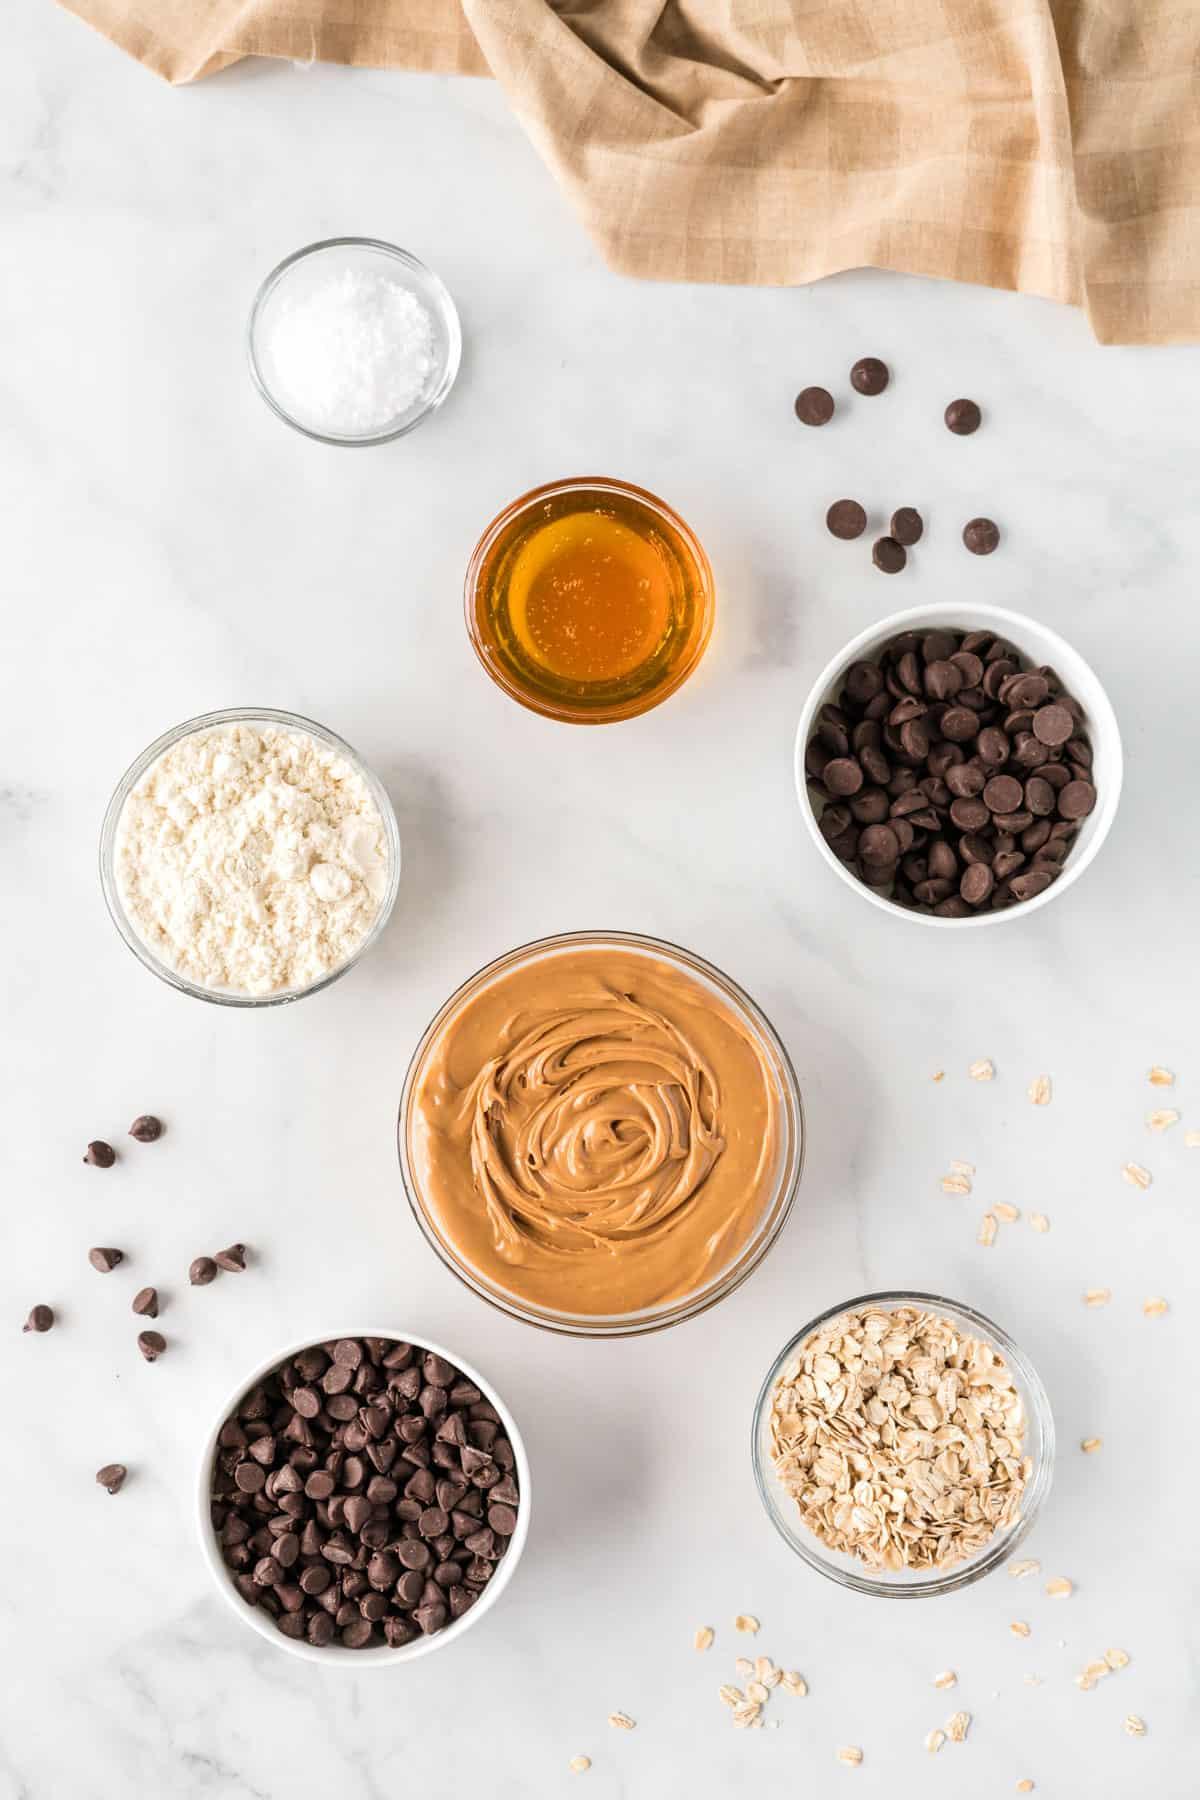 ingredients to make no bake protein bars